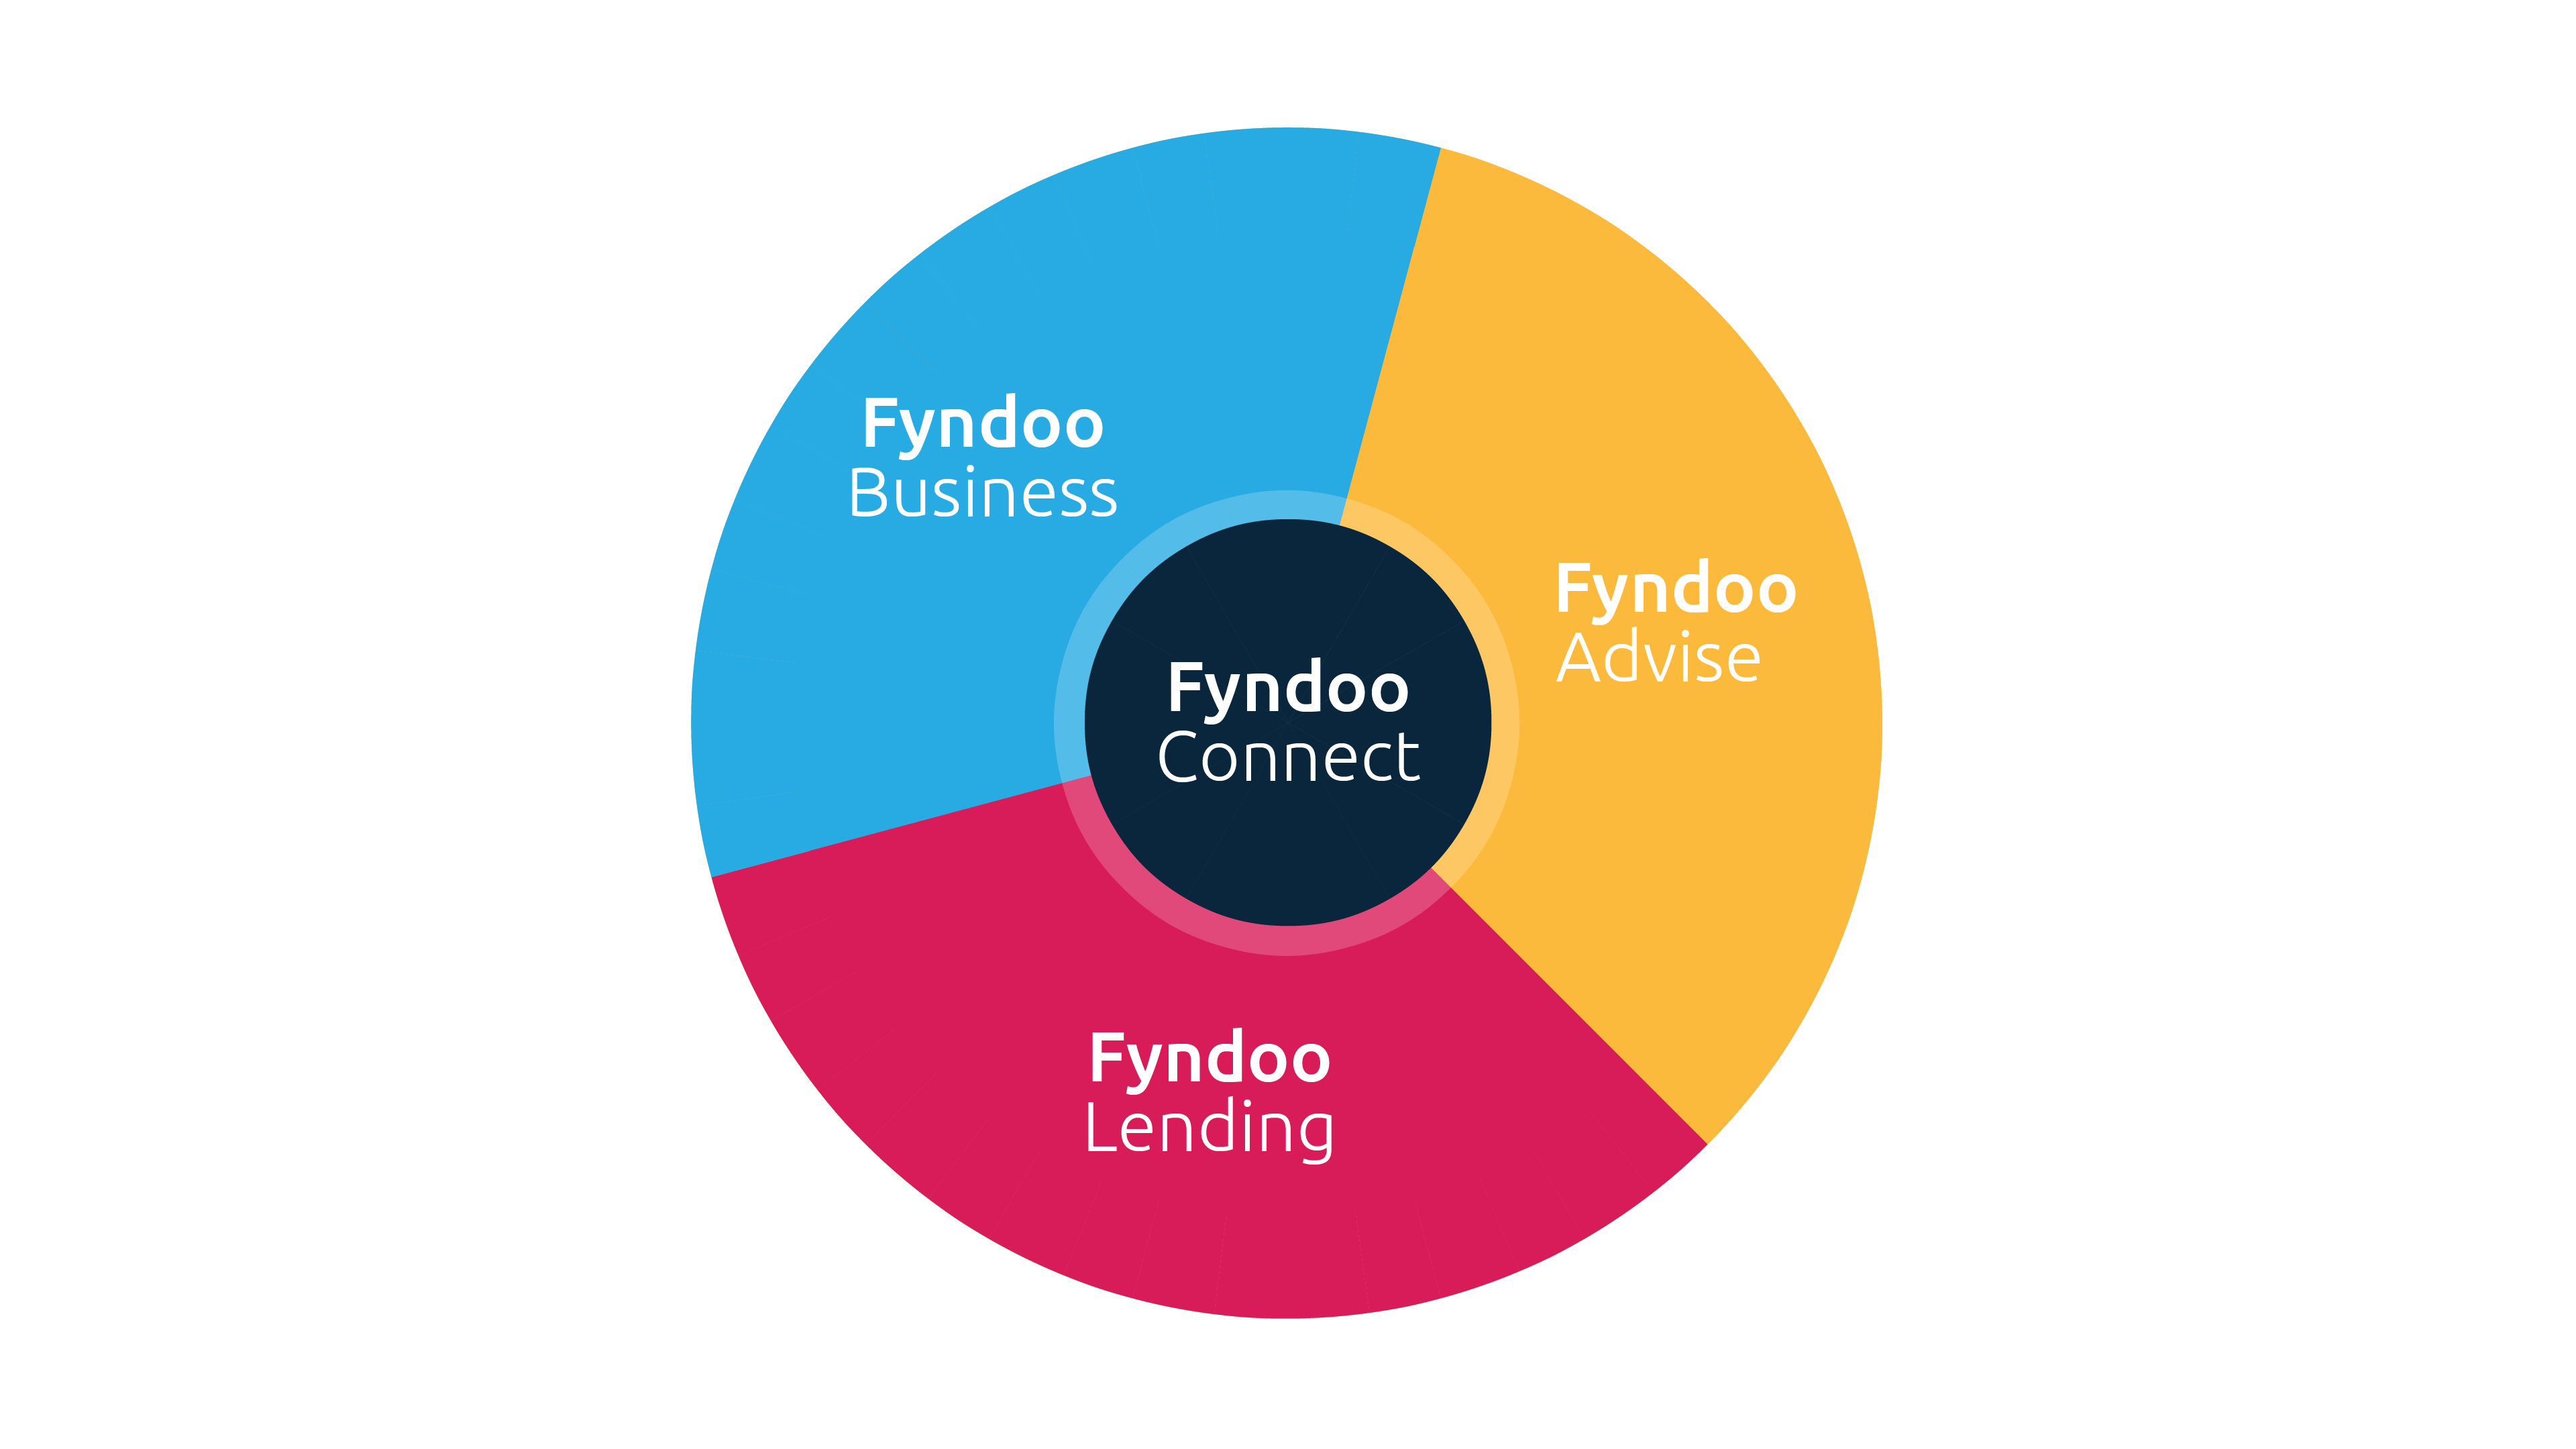 Fyndoo Ecosystem